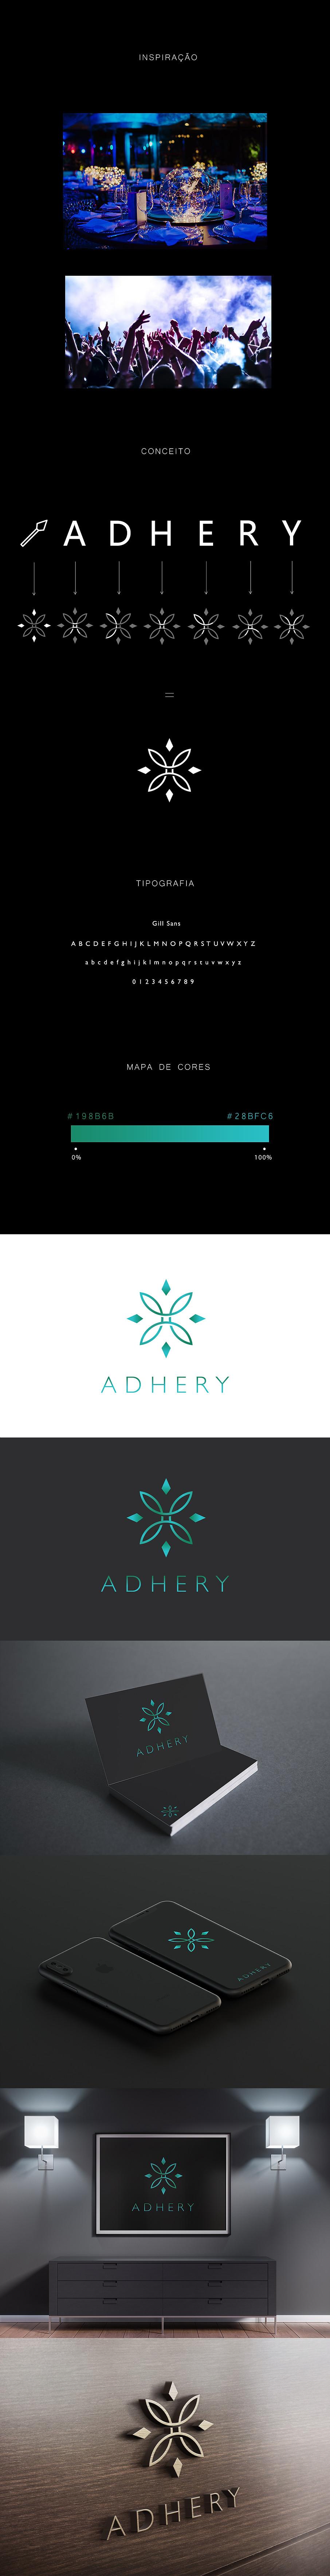 Adhery_apresentação.jpg